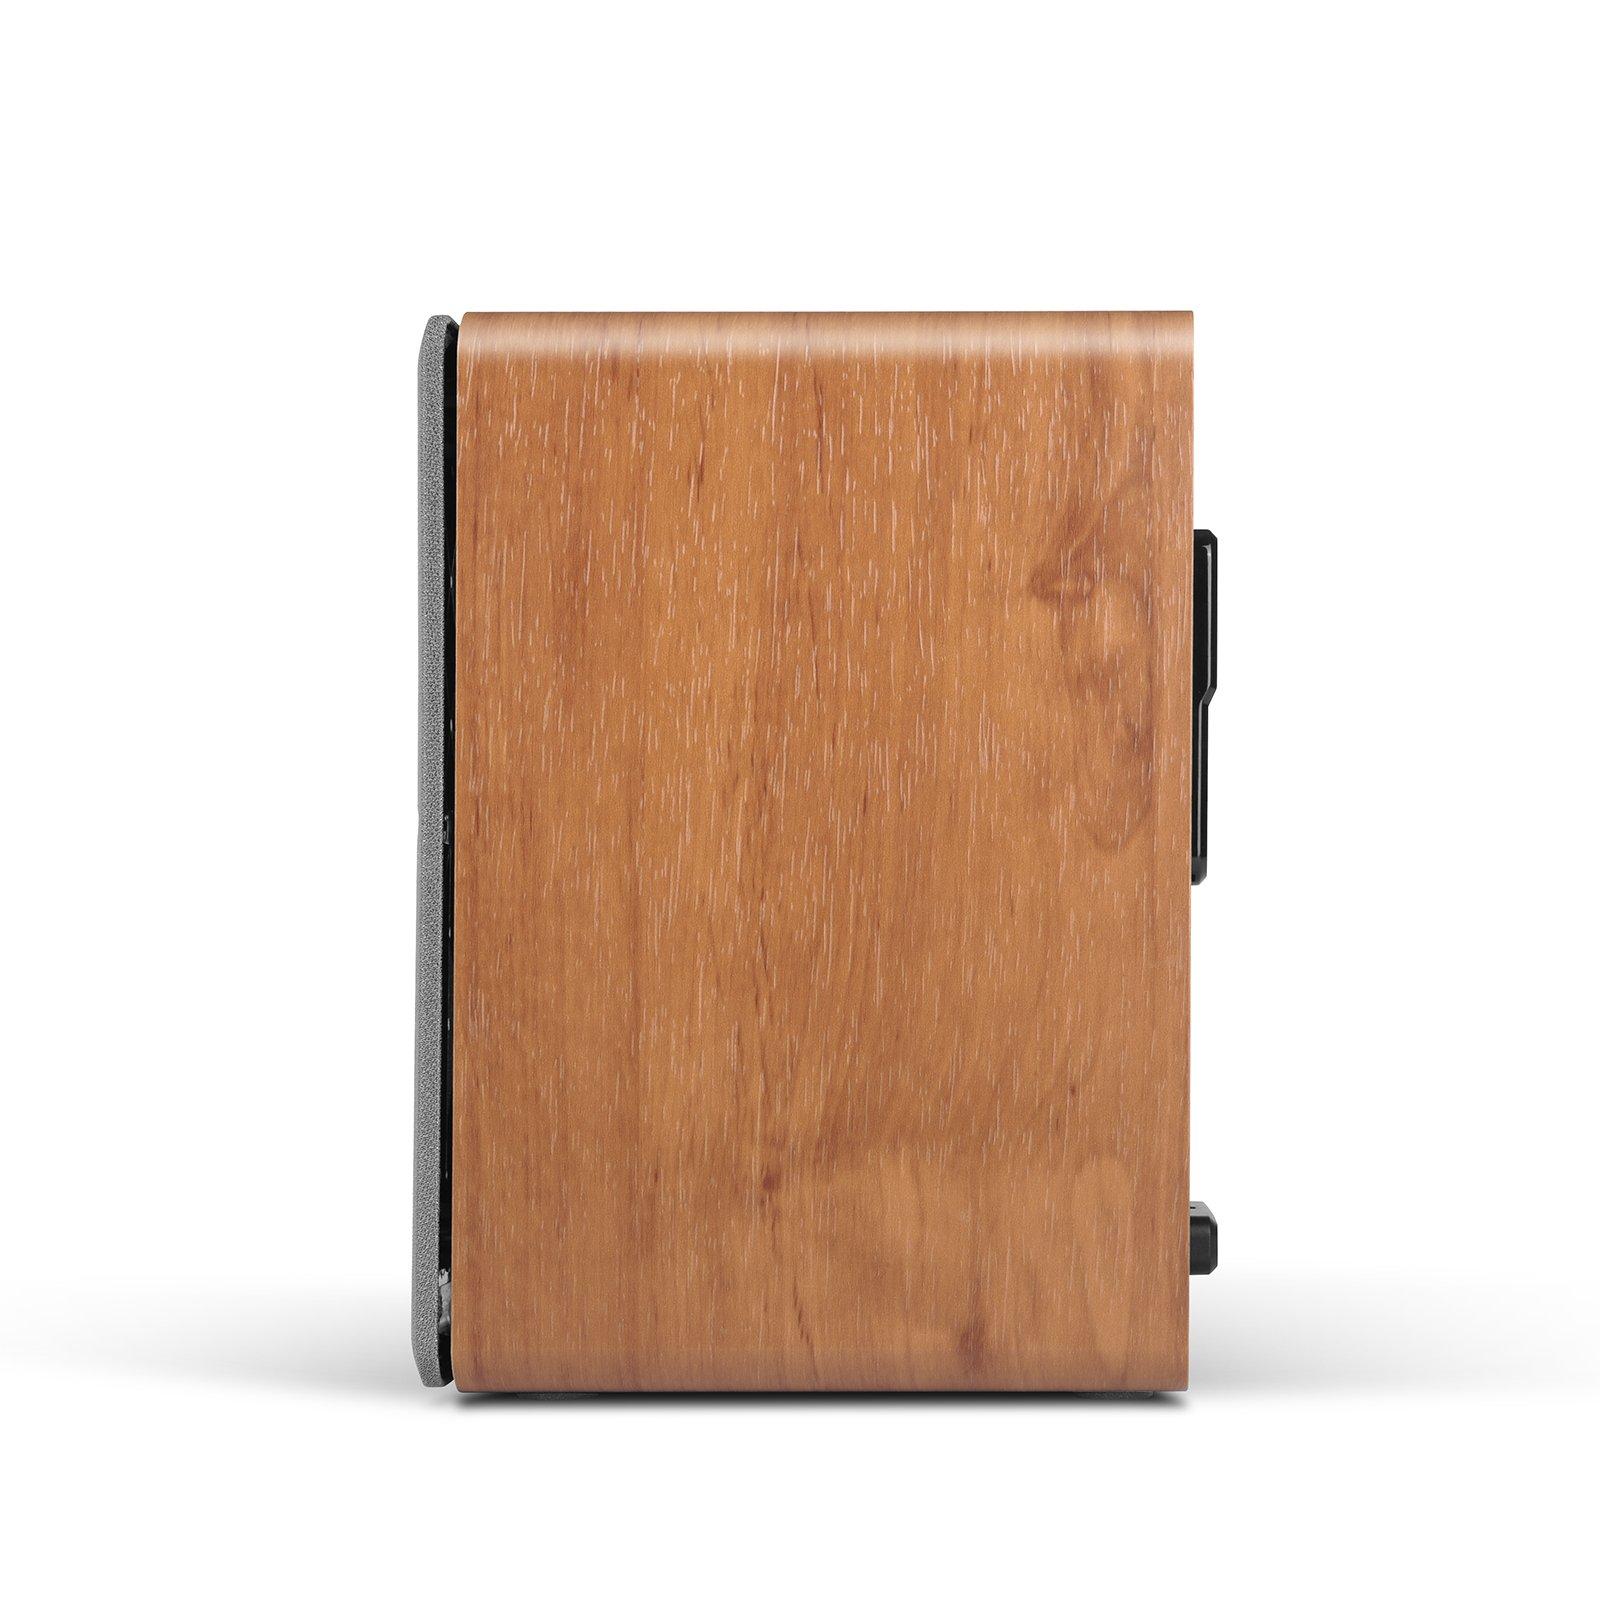 Edifier P12 Passive Bookshelf Speakers - 2-Way Speakers with Built-in Wall-Mount Bracket - Wood Color, Pair by Edifier (Image #2)